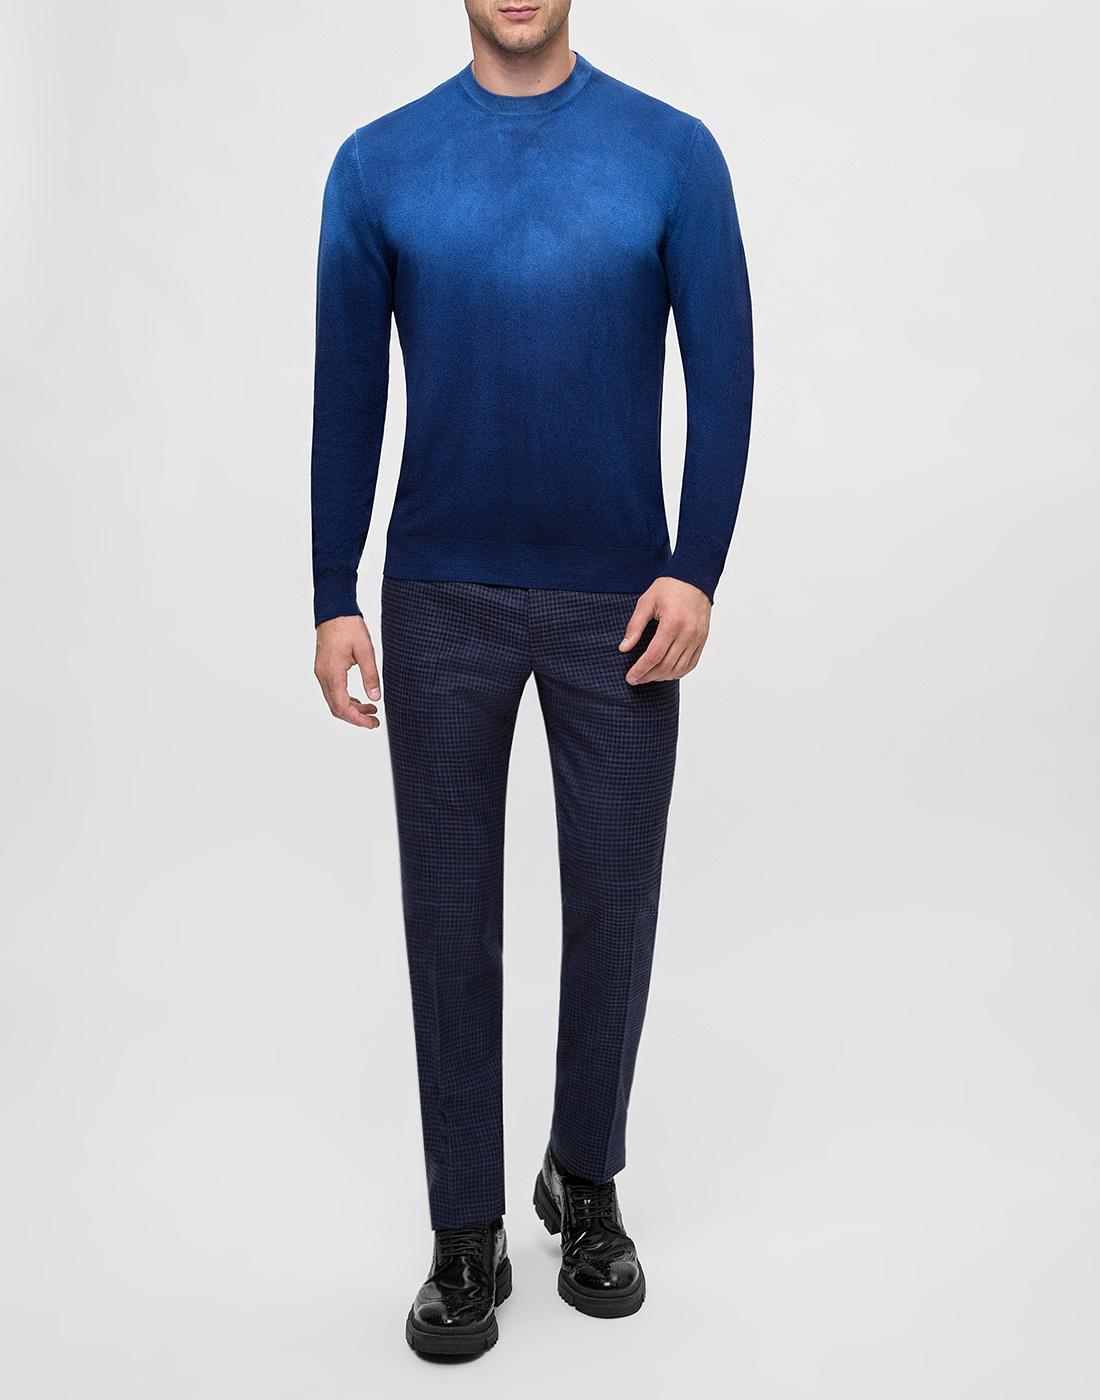 Мужской темно-синий джемпер  Bertolo S901638-5